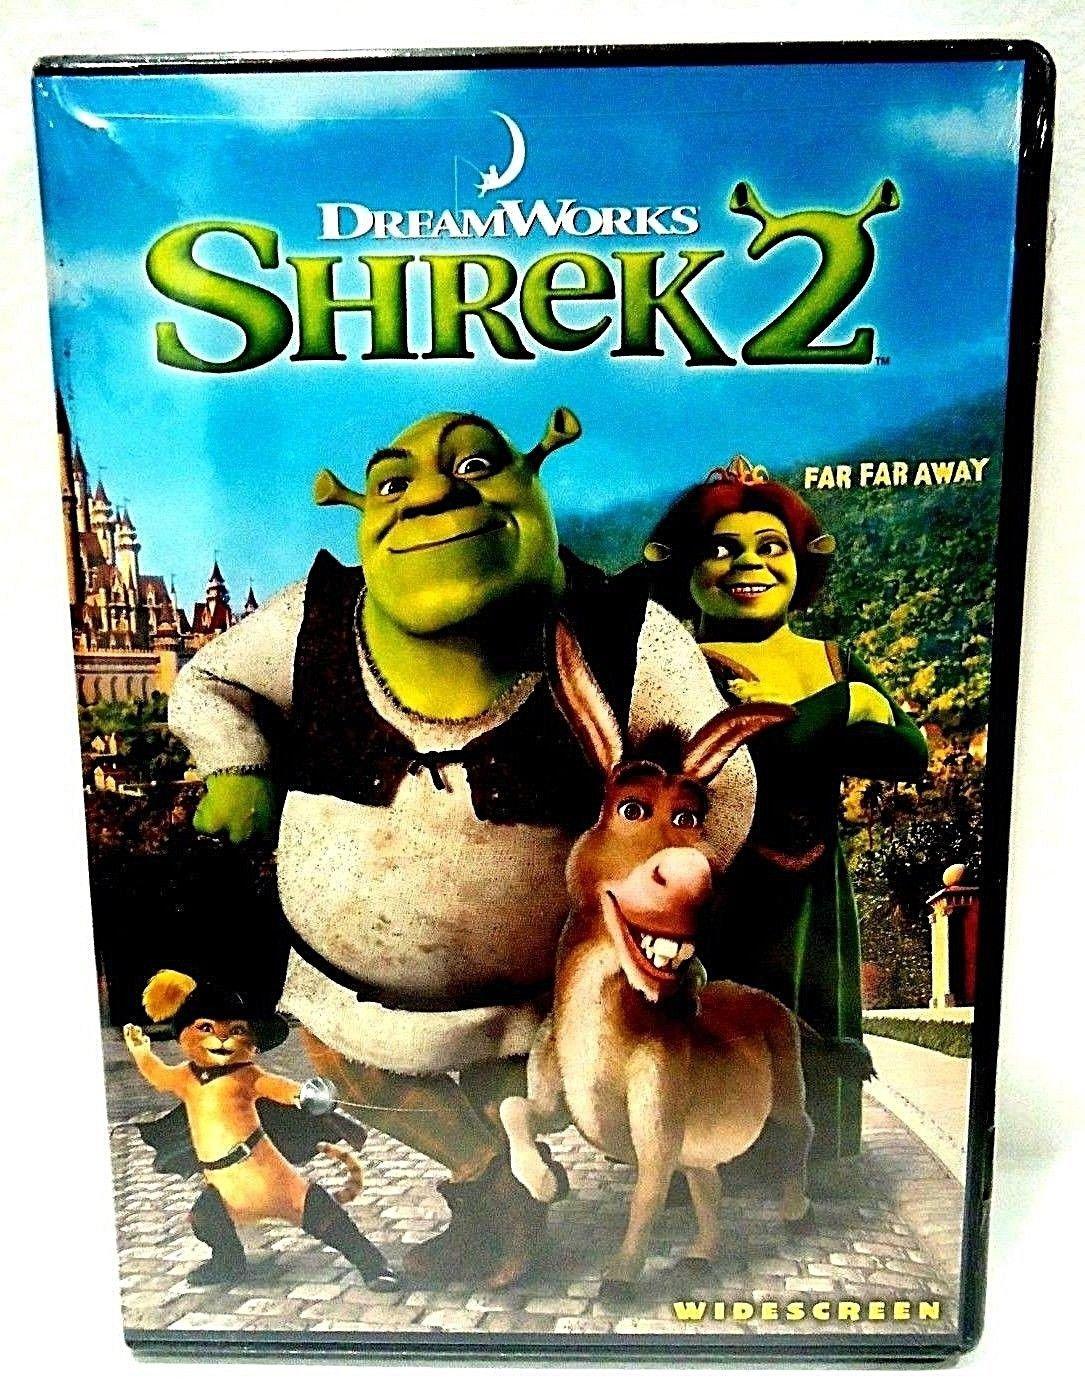 SHREK 2 - DVD - MIKE MYERS - CAMERON DIAZ - NEW - CARTOON - DREAMWORKS - MOVIE